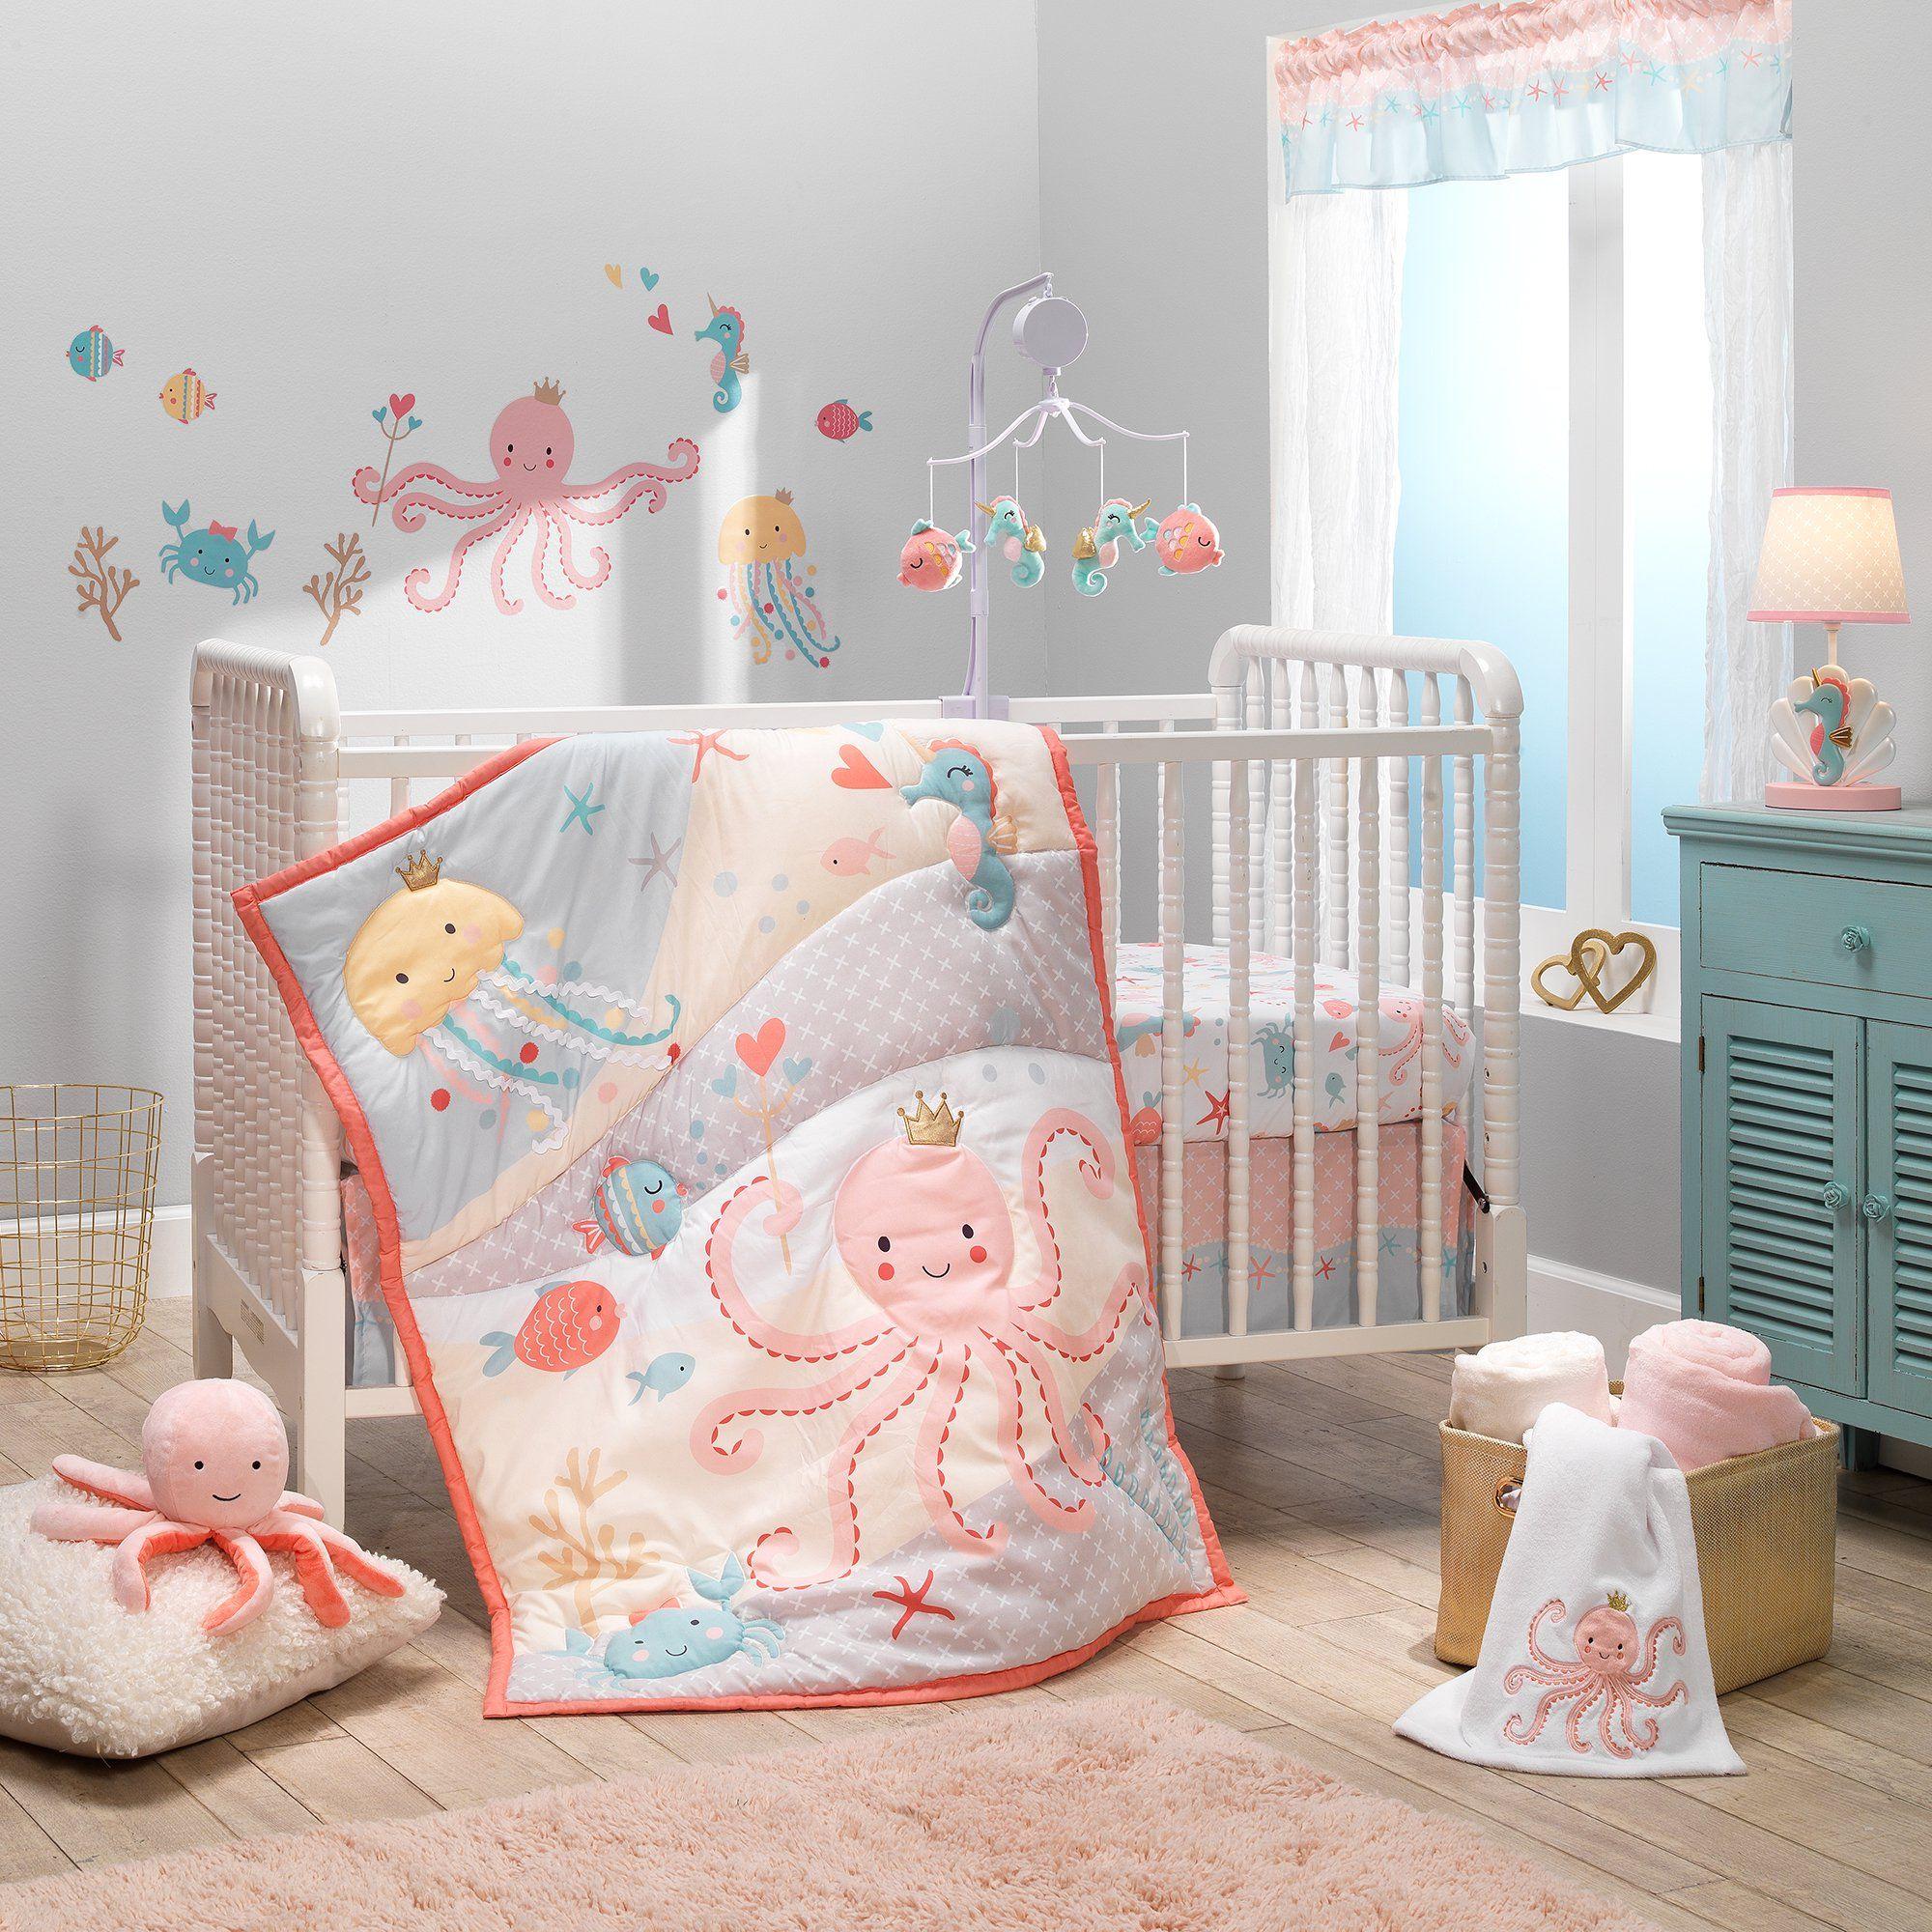 Bedtime Originals Ocean Mist Ocean Sea Animals Fitted Crib Sheet White Walmart Com Baby Crib Bedding Sets Baby Crib Bedding Crib Bedding